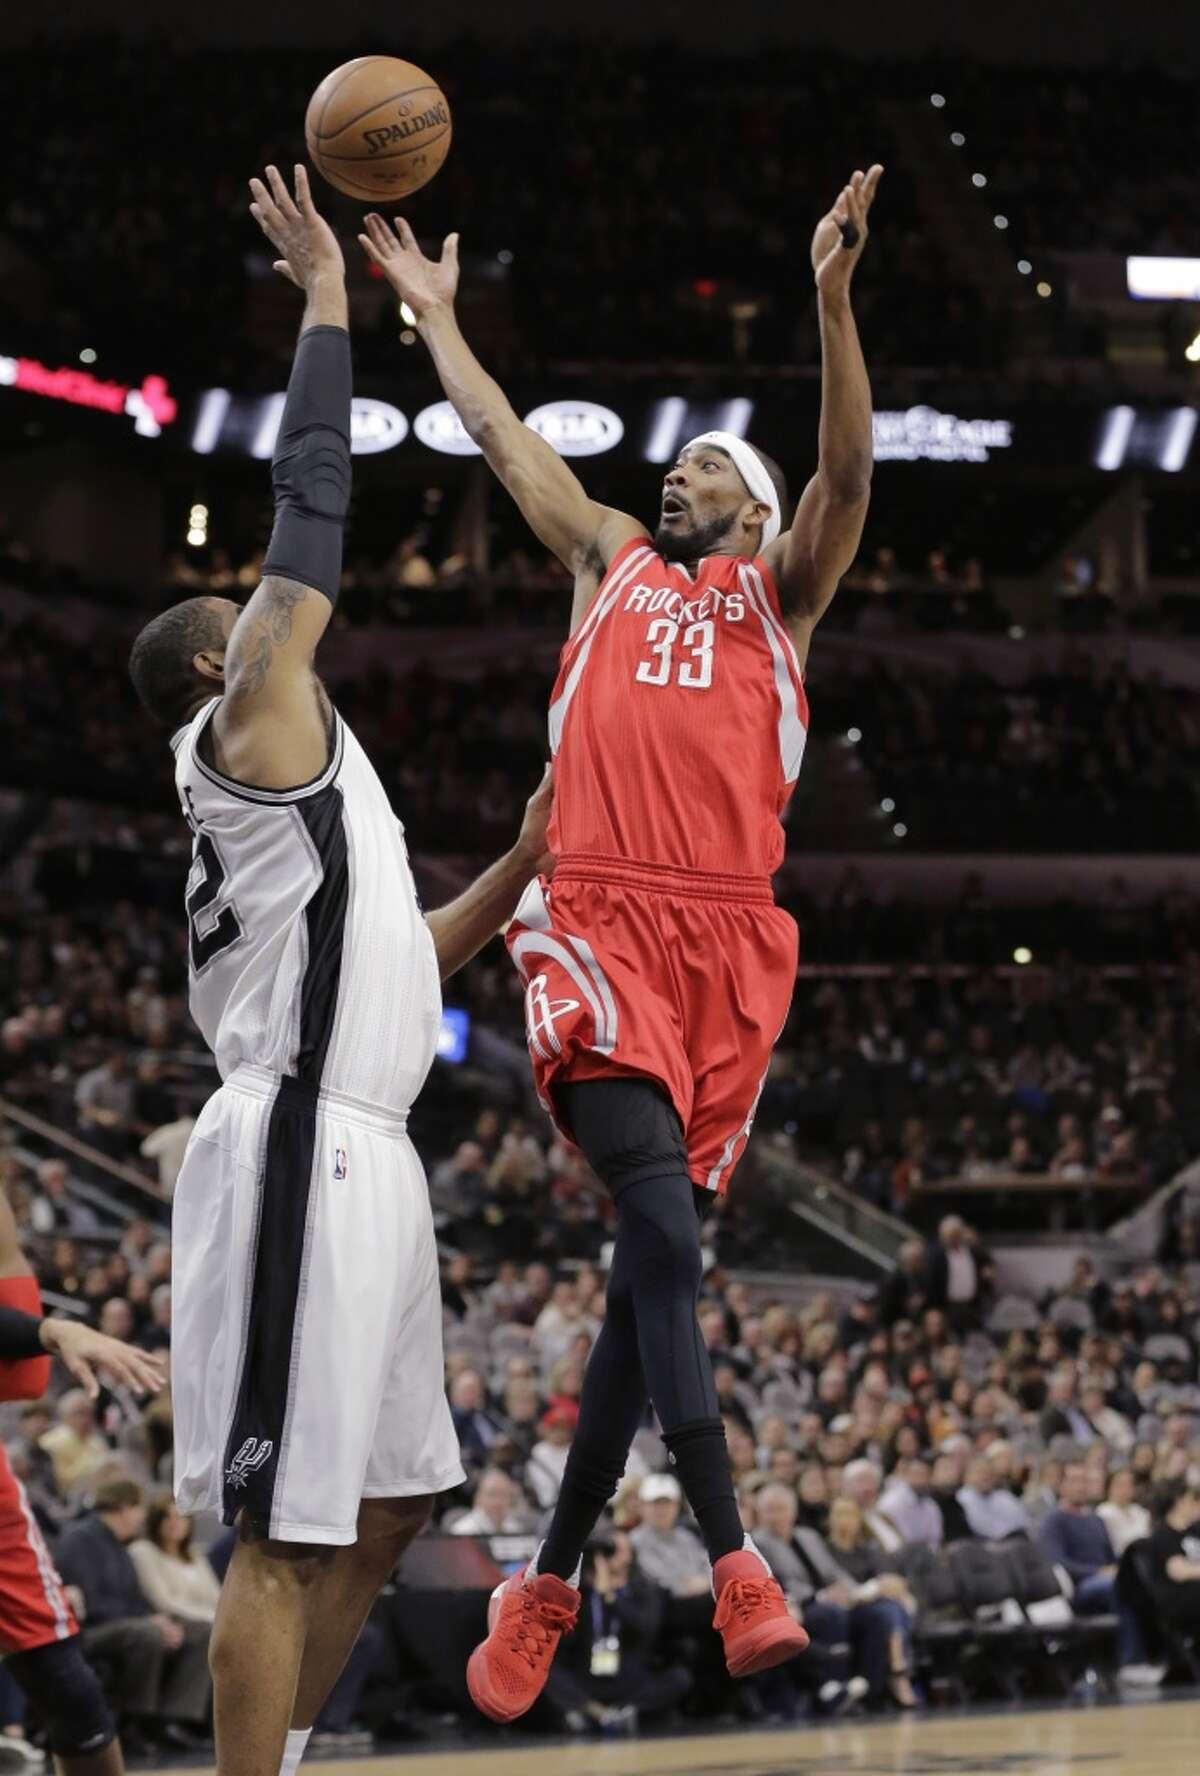 Houston Rockets guard Corey Brewer (33) shoots over San Antonio Spurs forward LaMarcus Aldridge (12) during the first half of an NBA basketball game Wednesday, Jan. 27, 2016, in San Antonio. (AP Photo/Eric Gay)